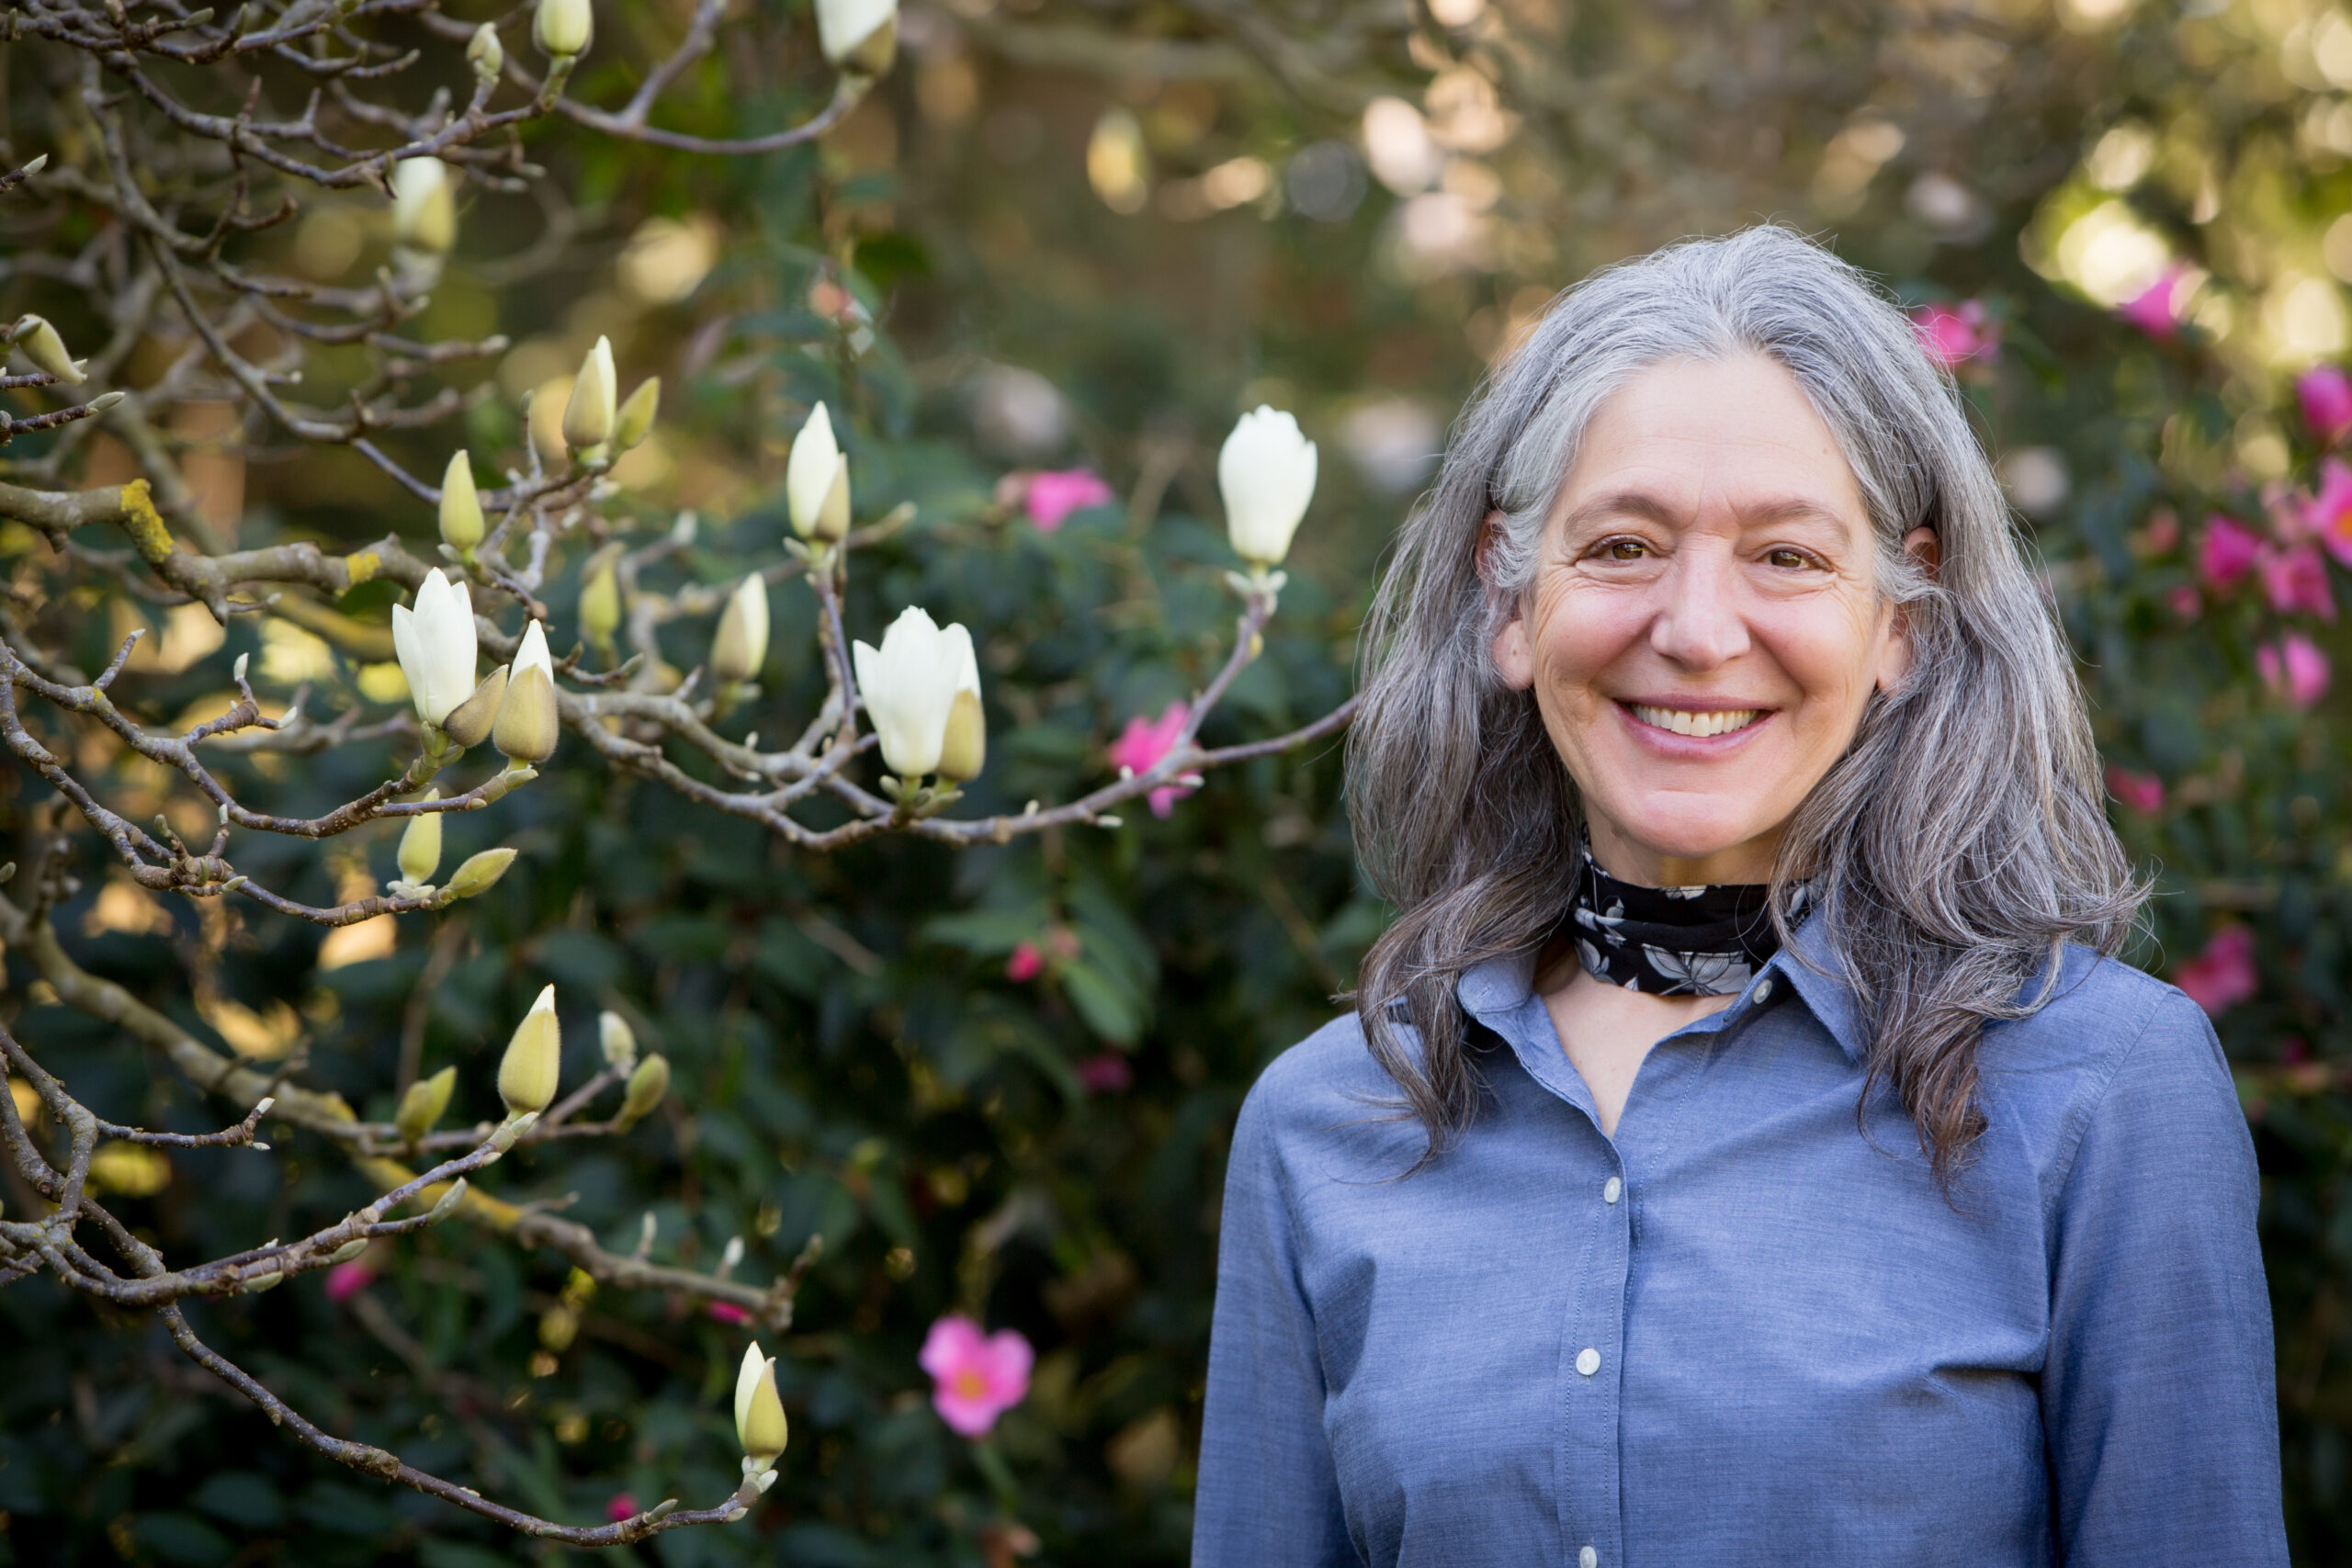 Colette Lafia, author of The Divine Heart